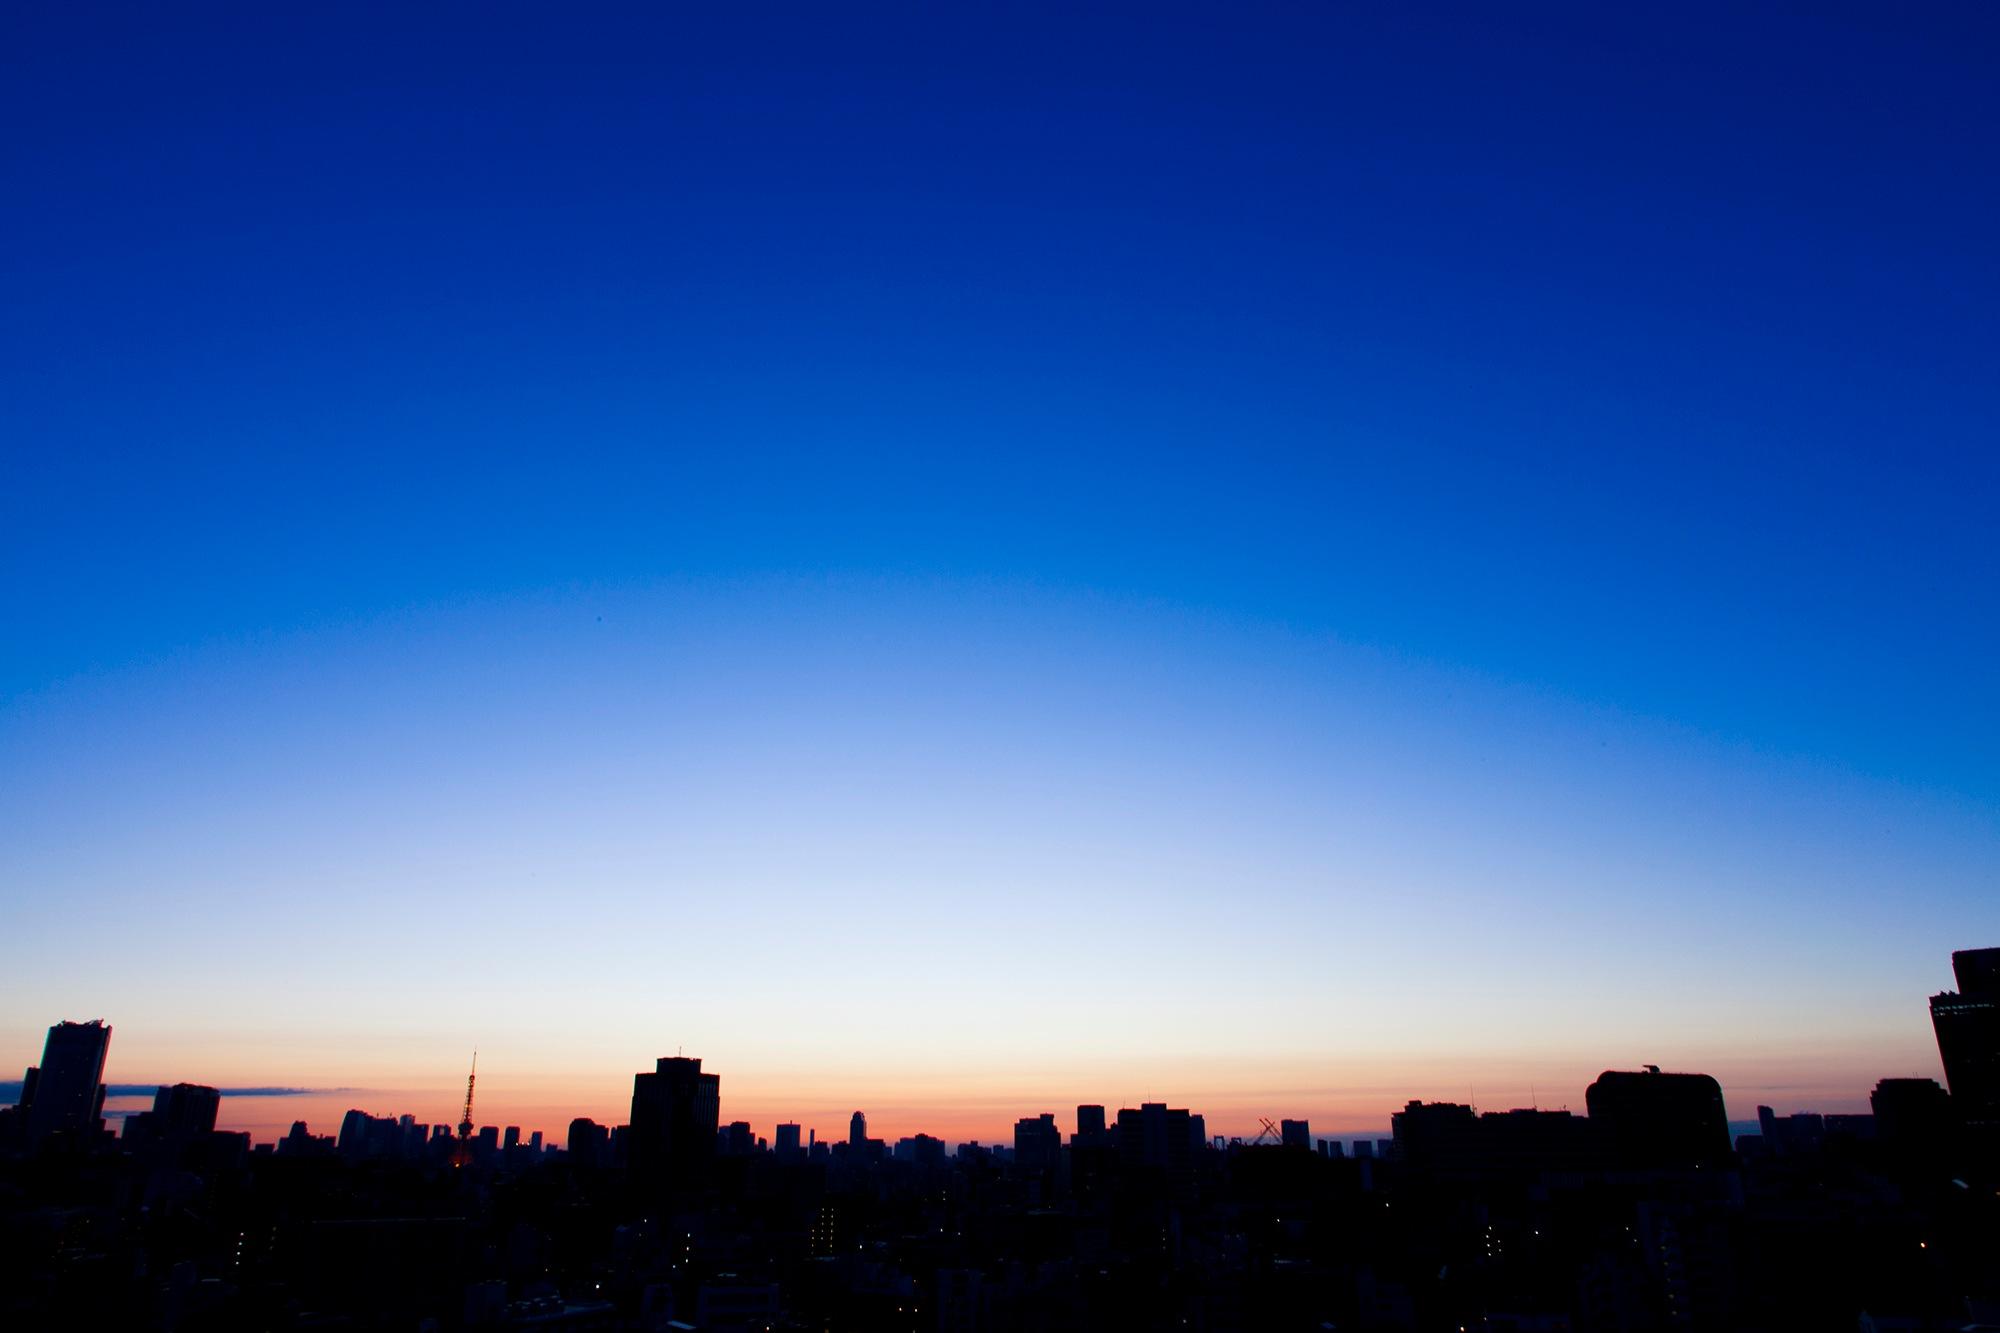 Dawn by Kunitaka Kawashimo